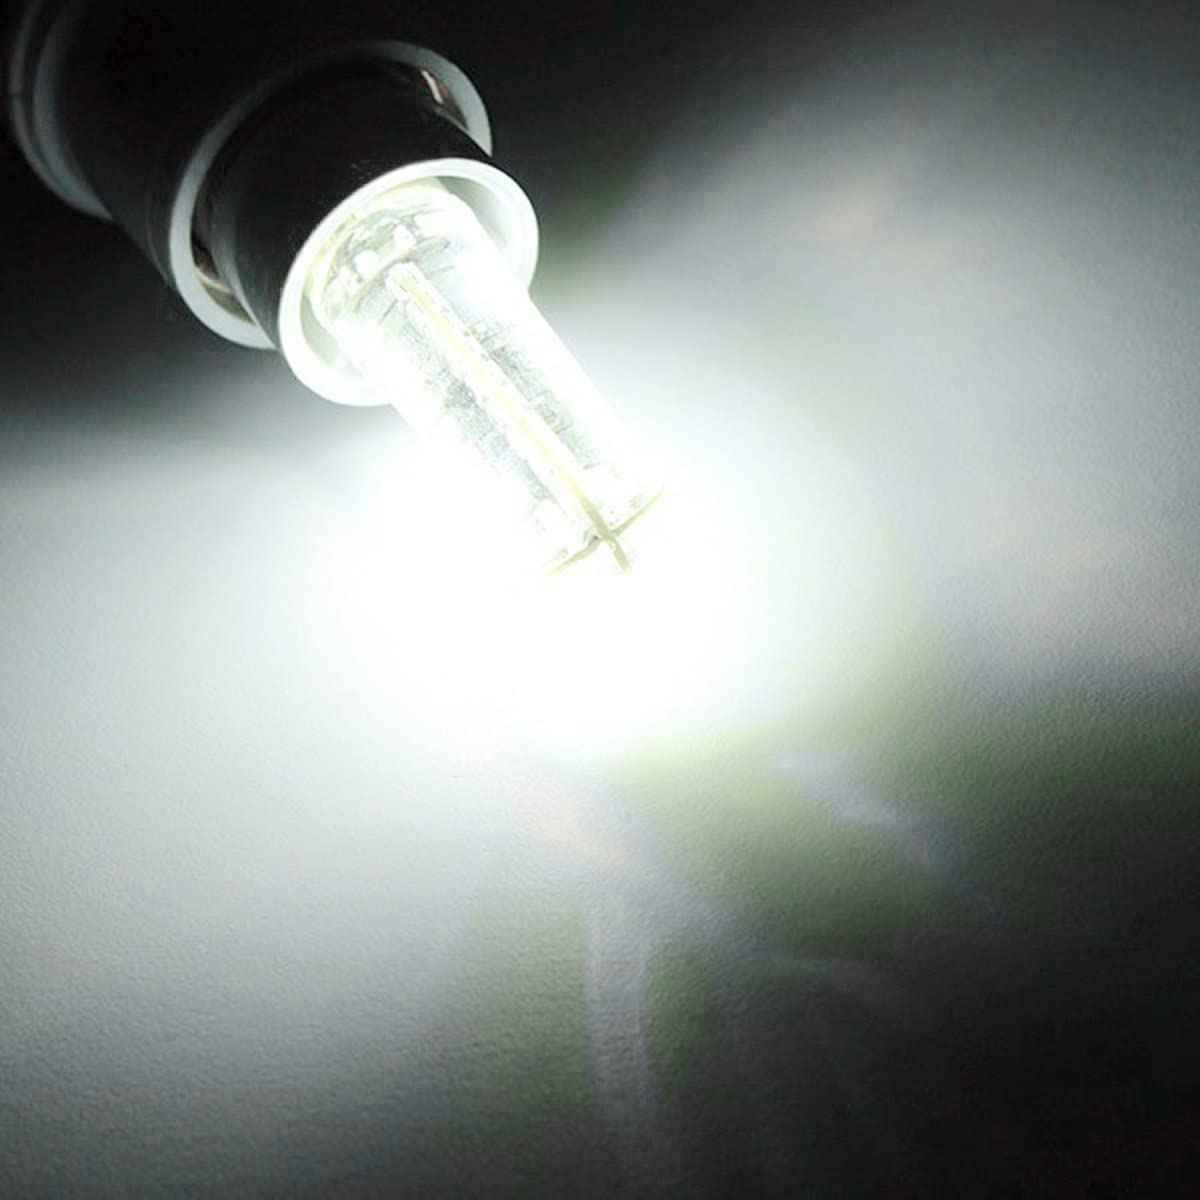 1PCS Color : Cold White, Size : 110V LLP-LED Dimmable G9 LED Bulb Bi-Pin Base 5W 80LED 5730SMD 400-500Lm Warm White//Cool White LED Lights AC 220 V//AC 110V